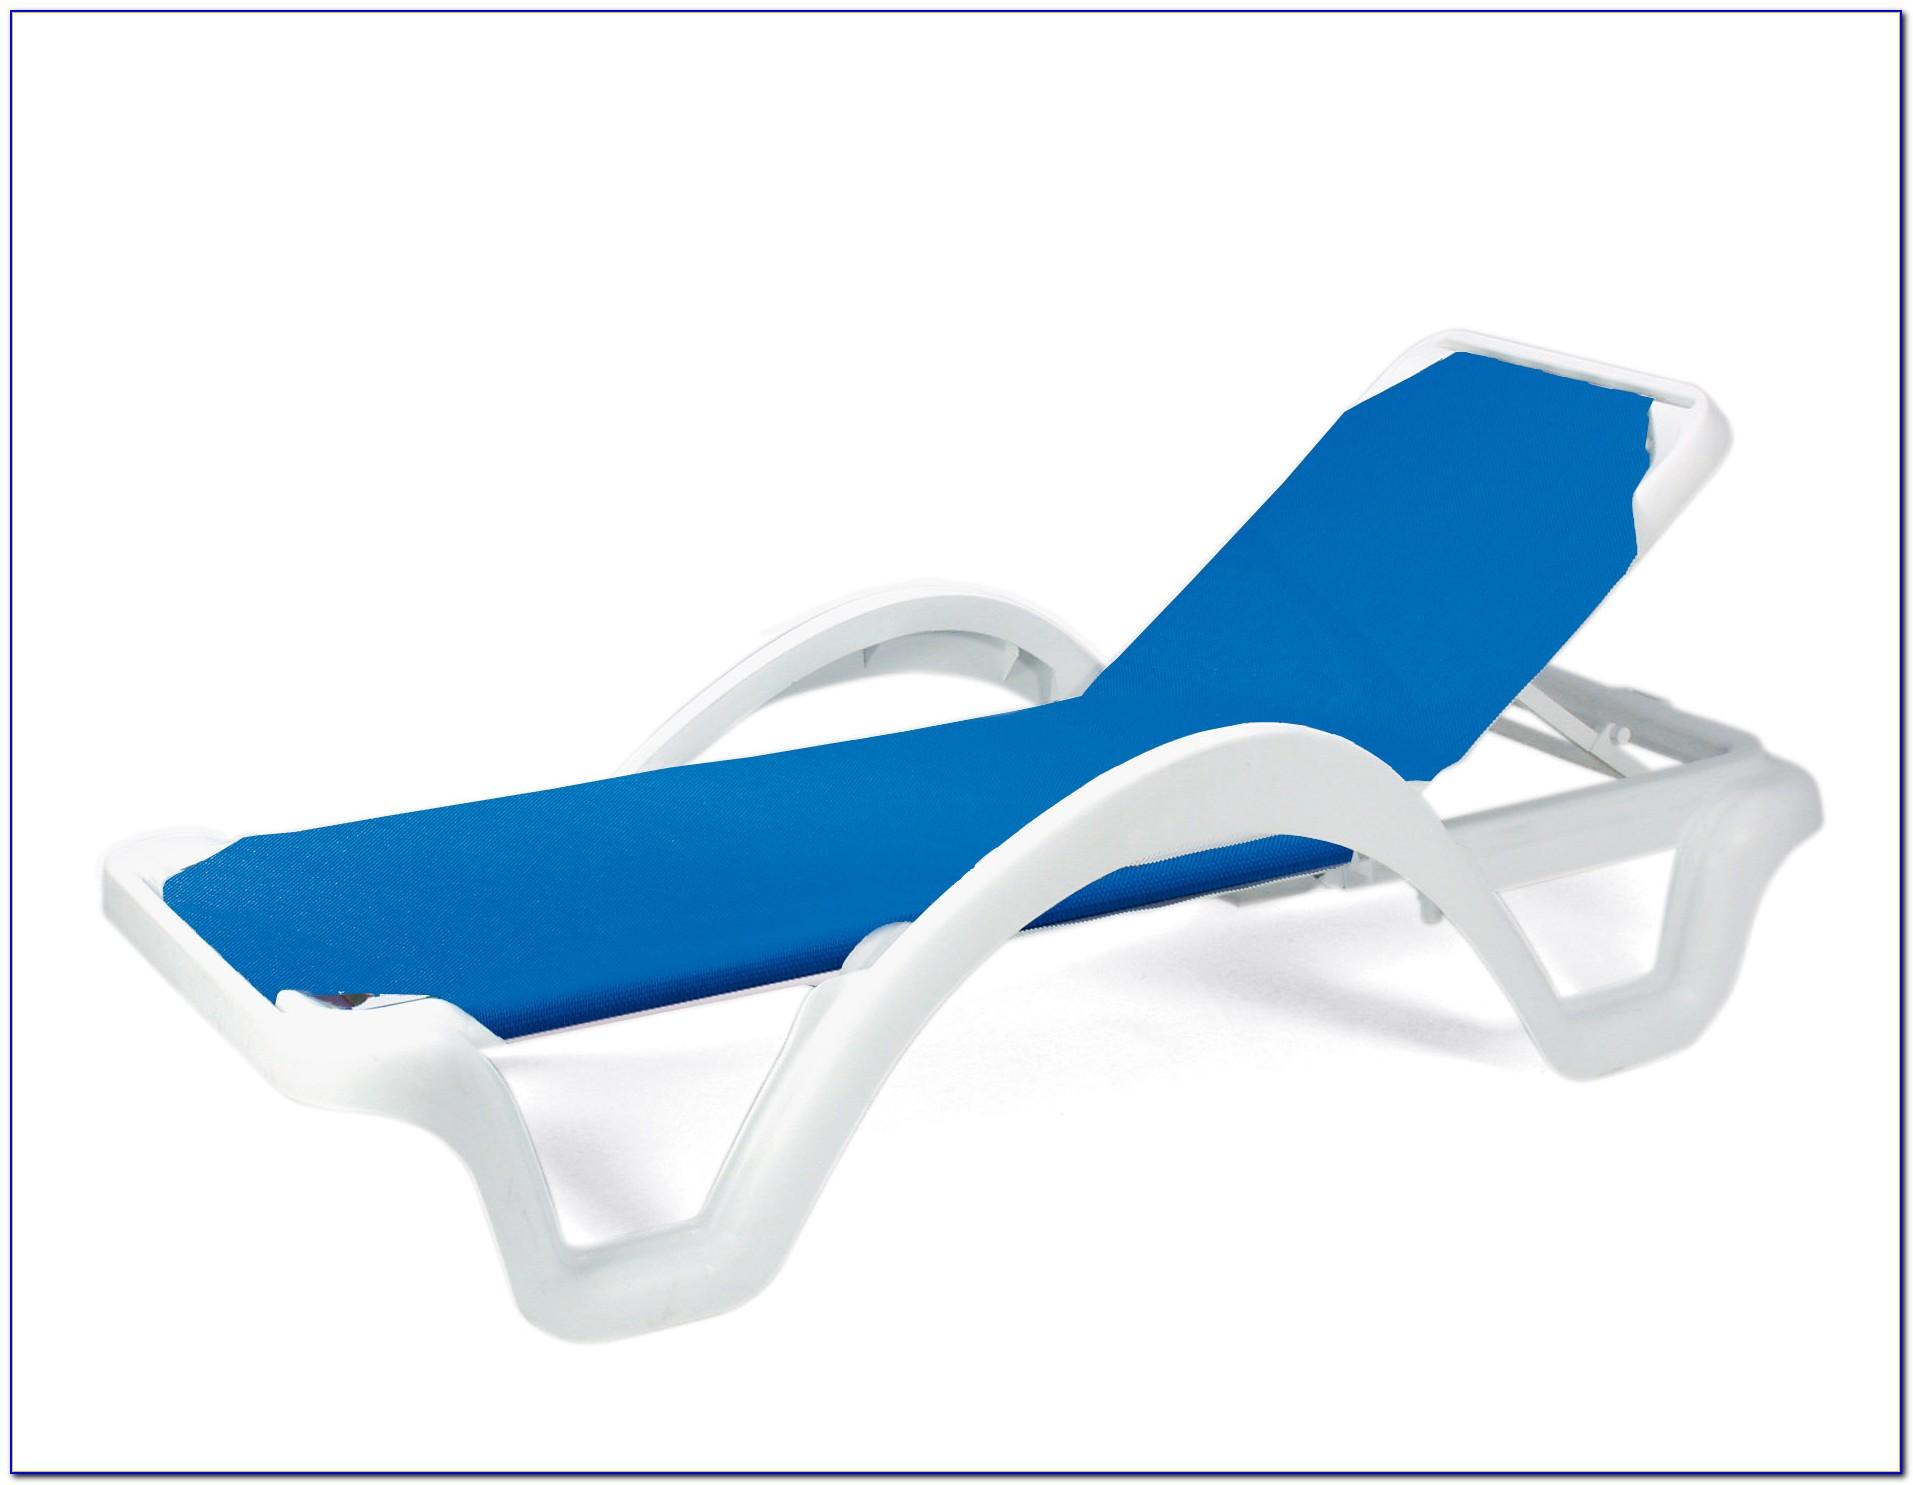 Hard Plastic Pool Lounge Chairs